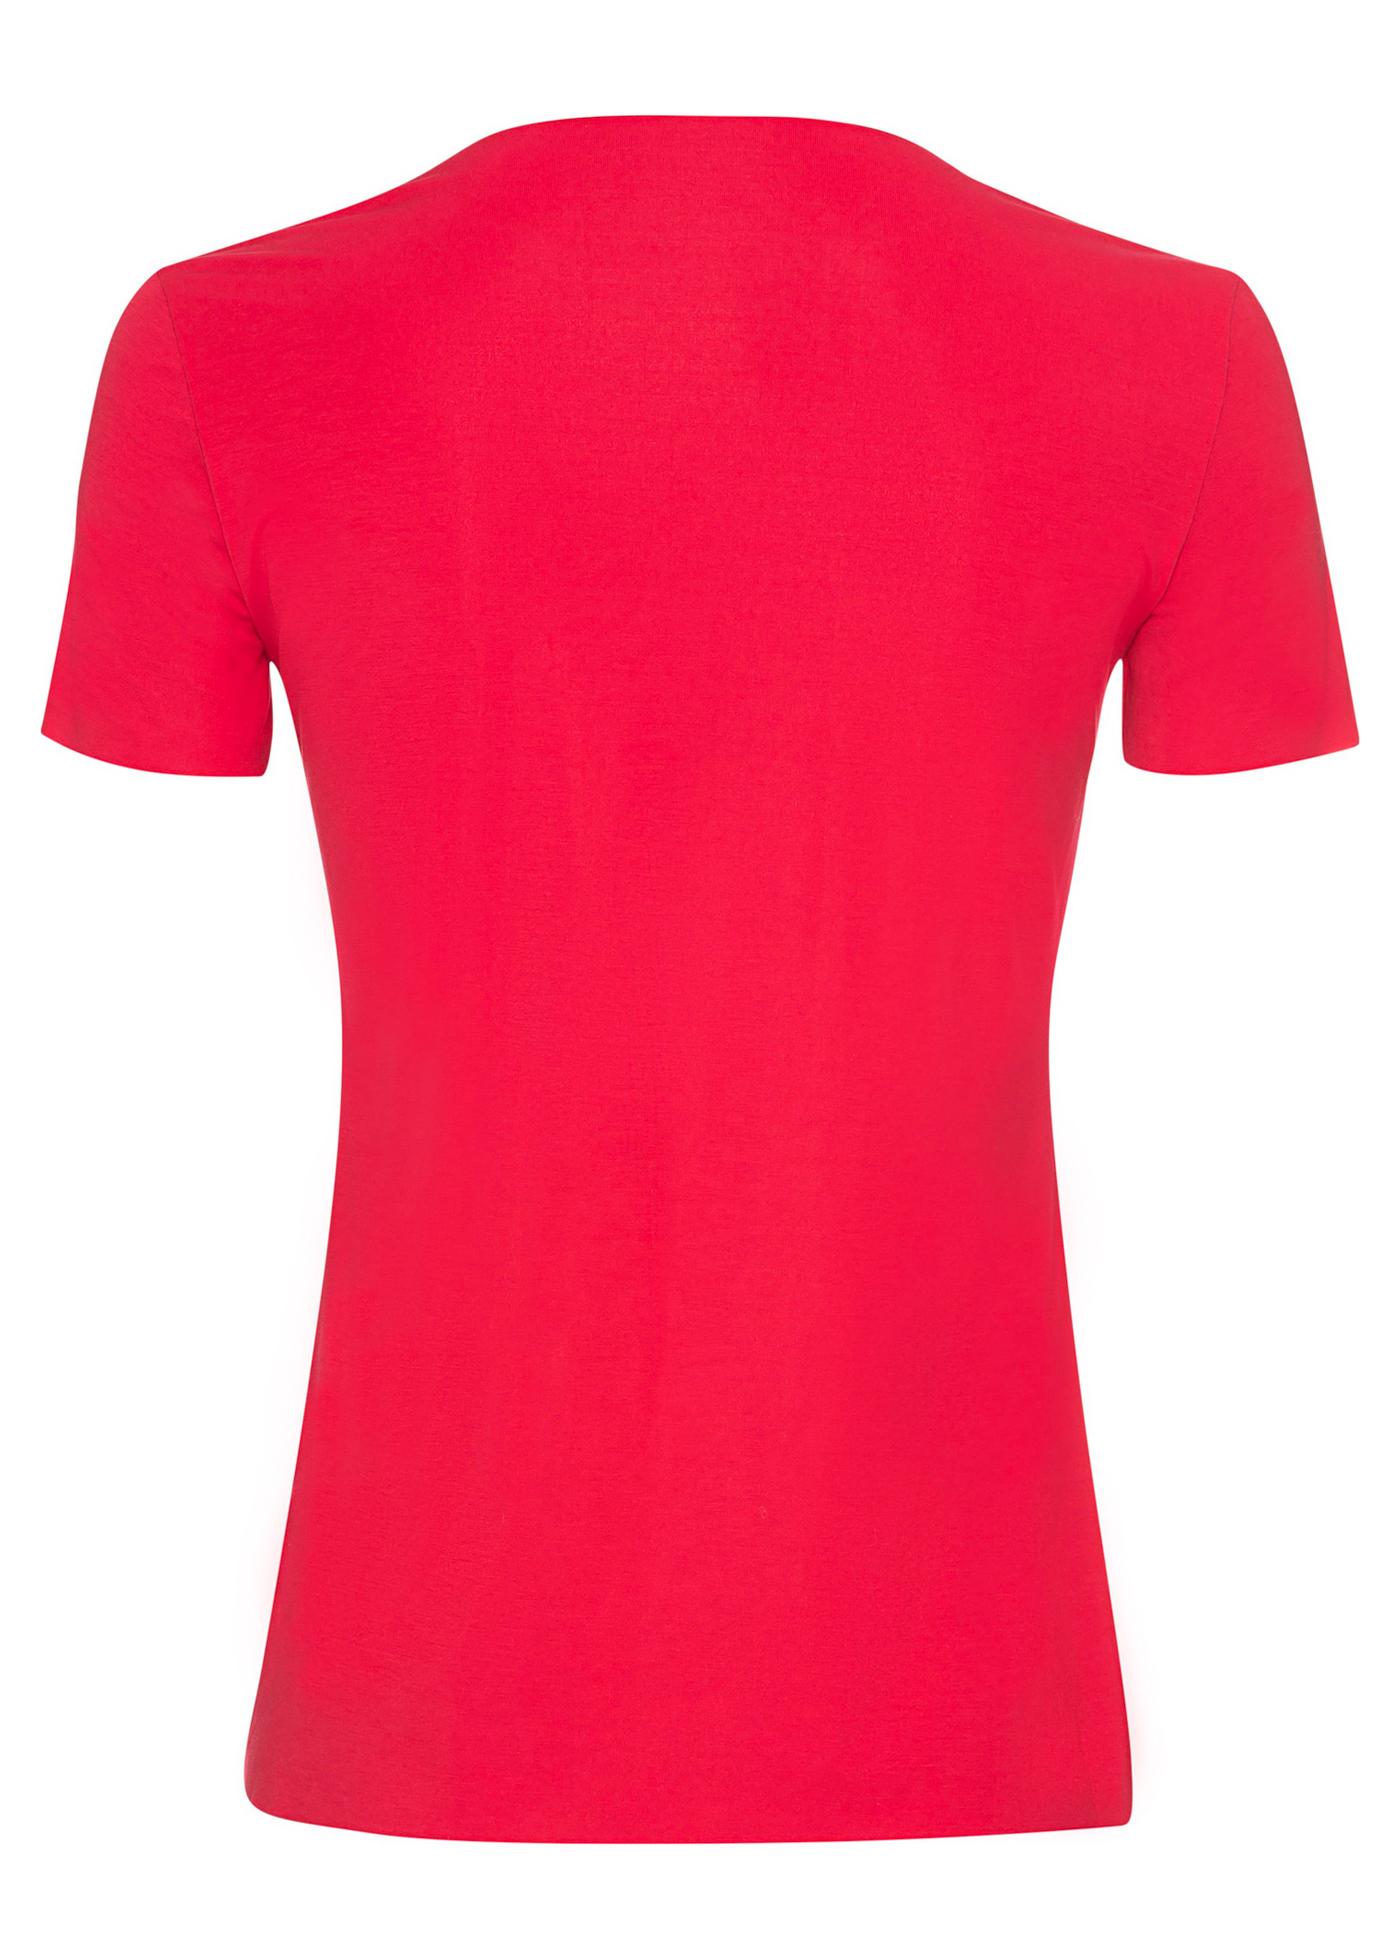 Aurora Pure Shirt image number 1